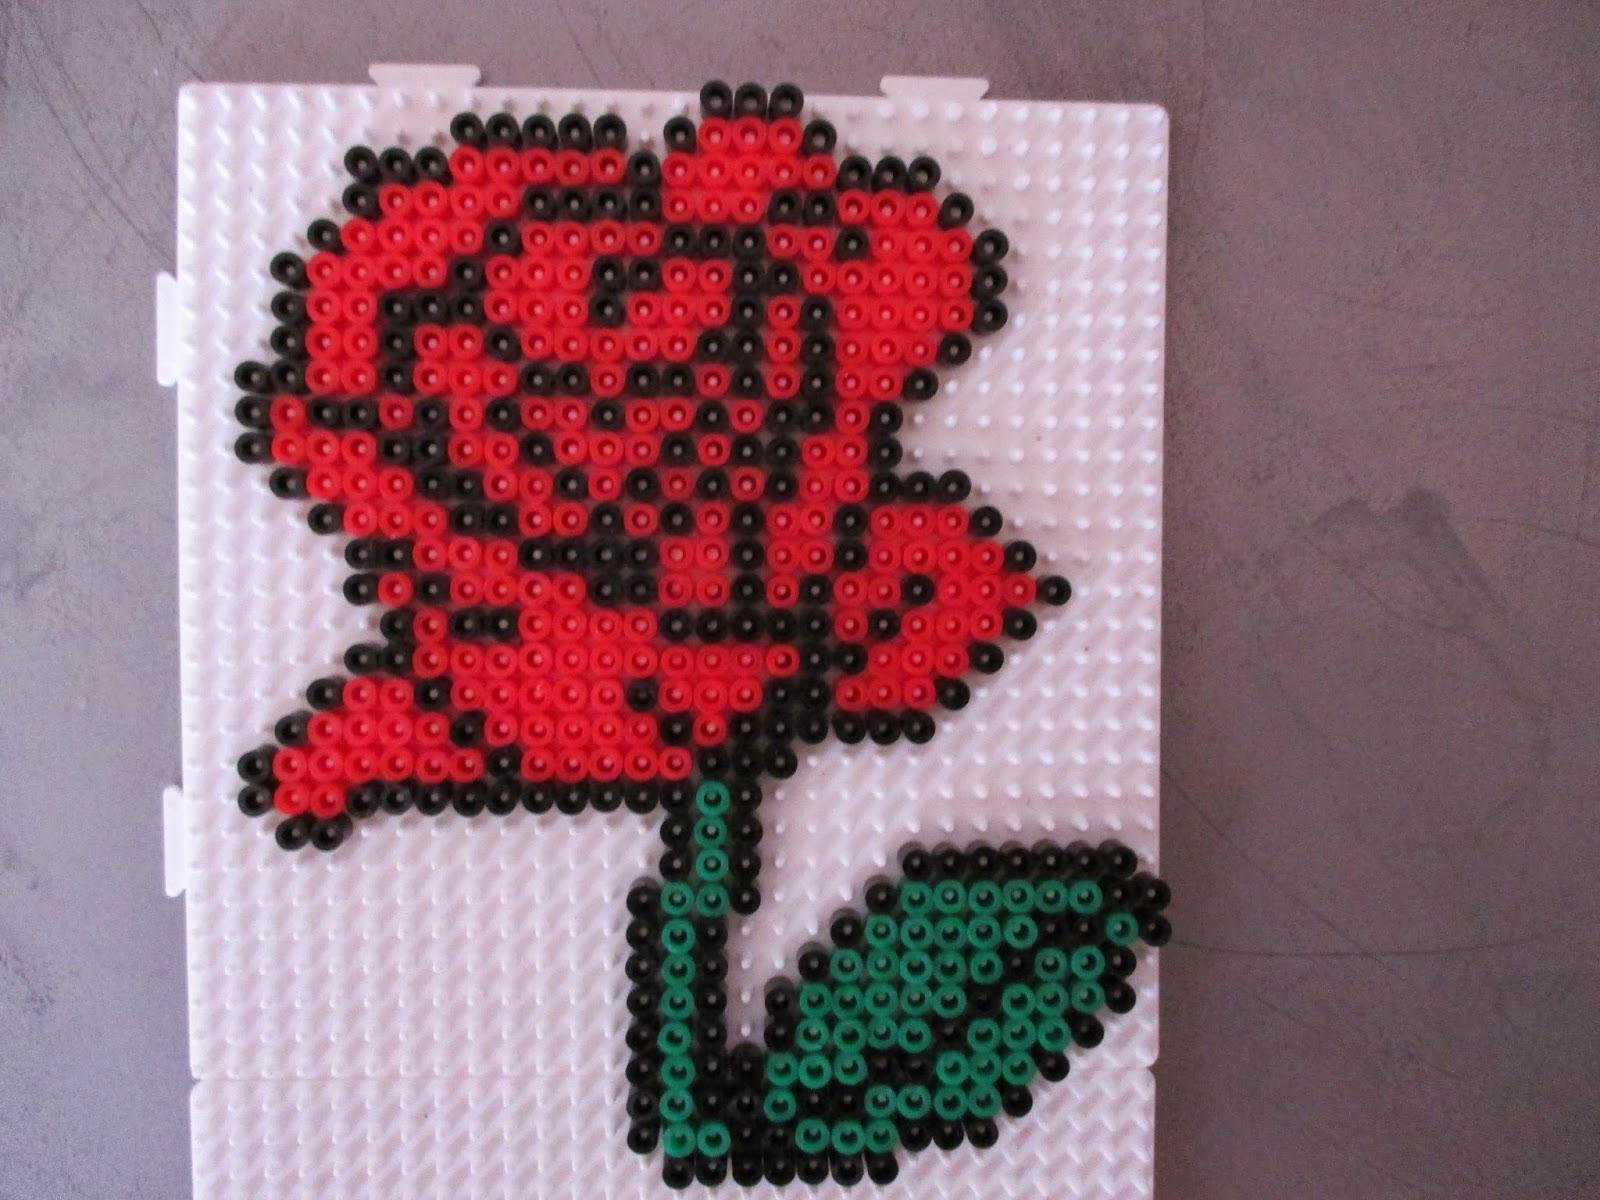 pixel art en perle hama rose en perler beads. Black Bedroom Furniture Sets. Home Design Ideas